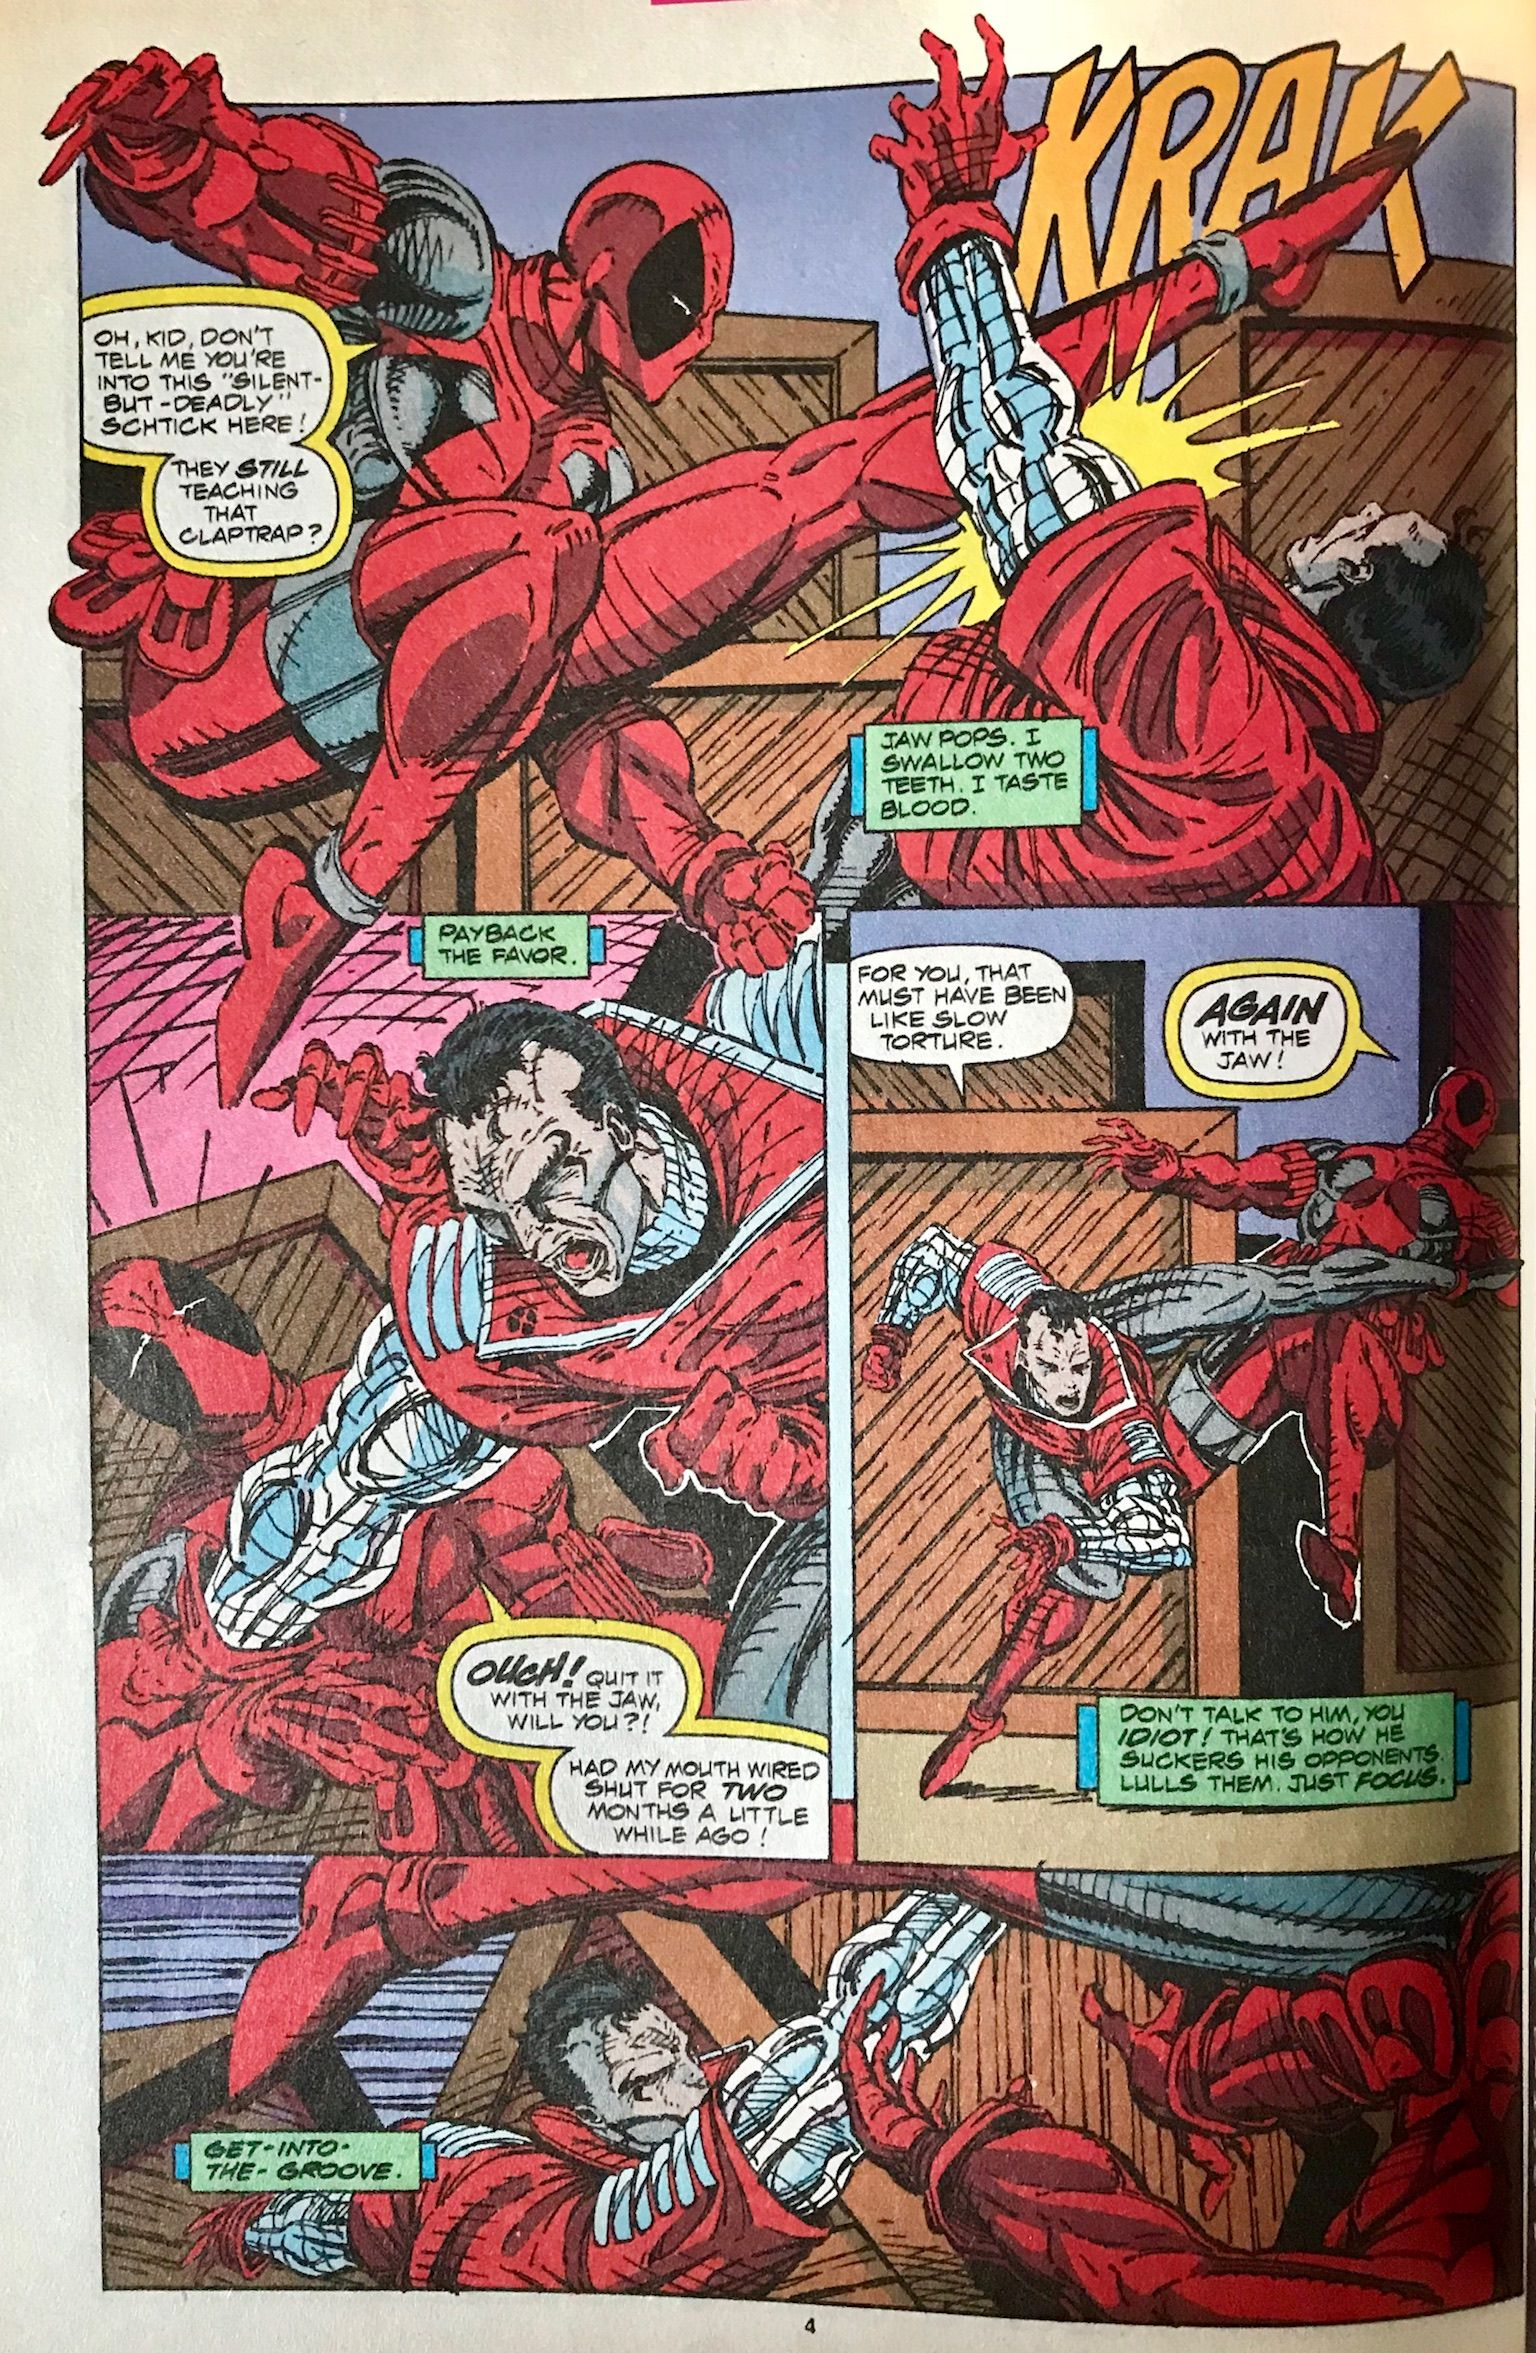 Deadpool vs Kane by Rob Liefeld and Brad Vancata 1991 | WHO? VS WHO ...